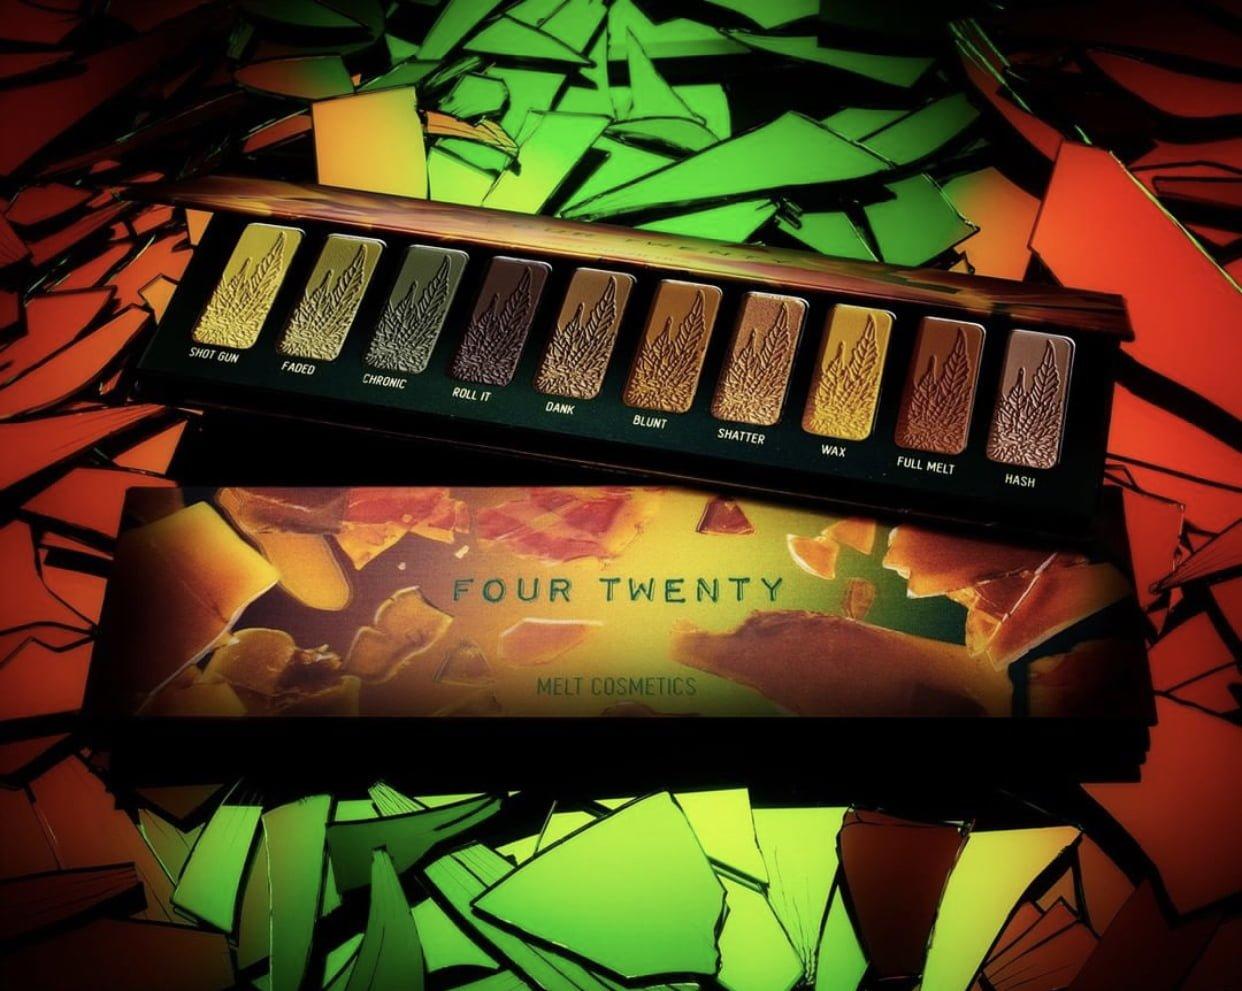 Melt Cosmetics Four Twenty Collection